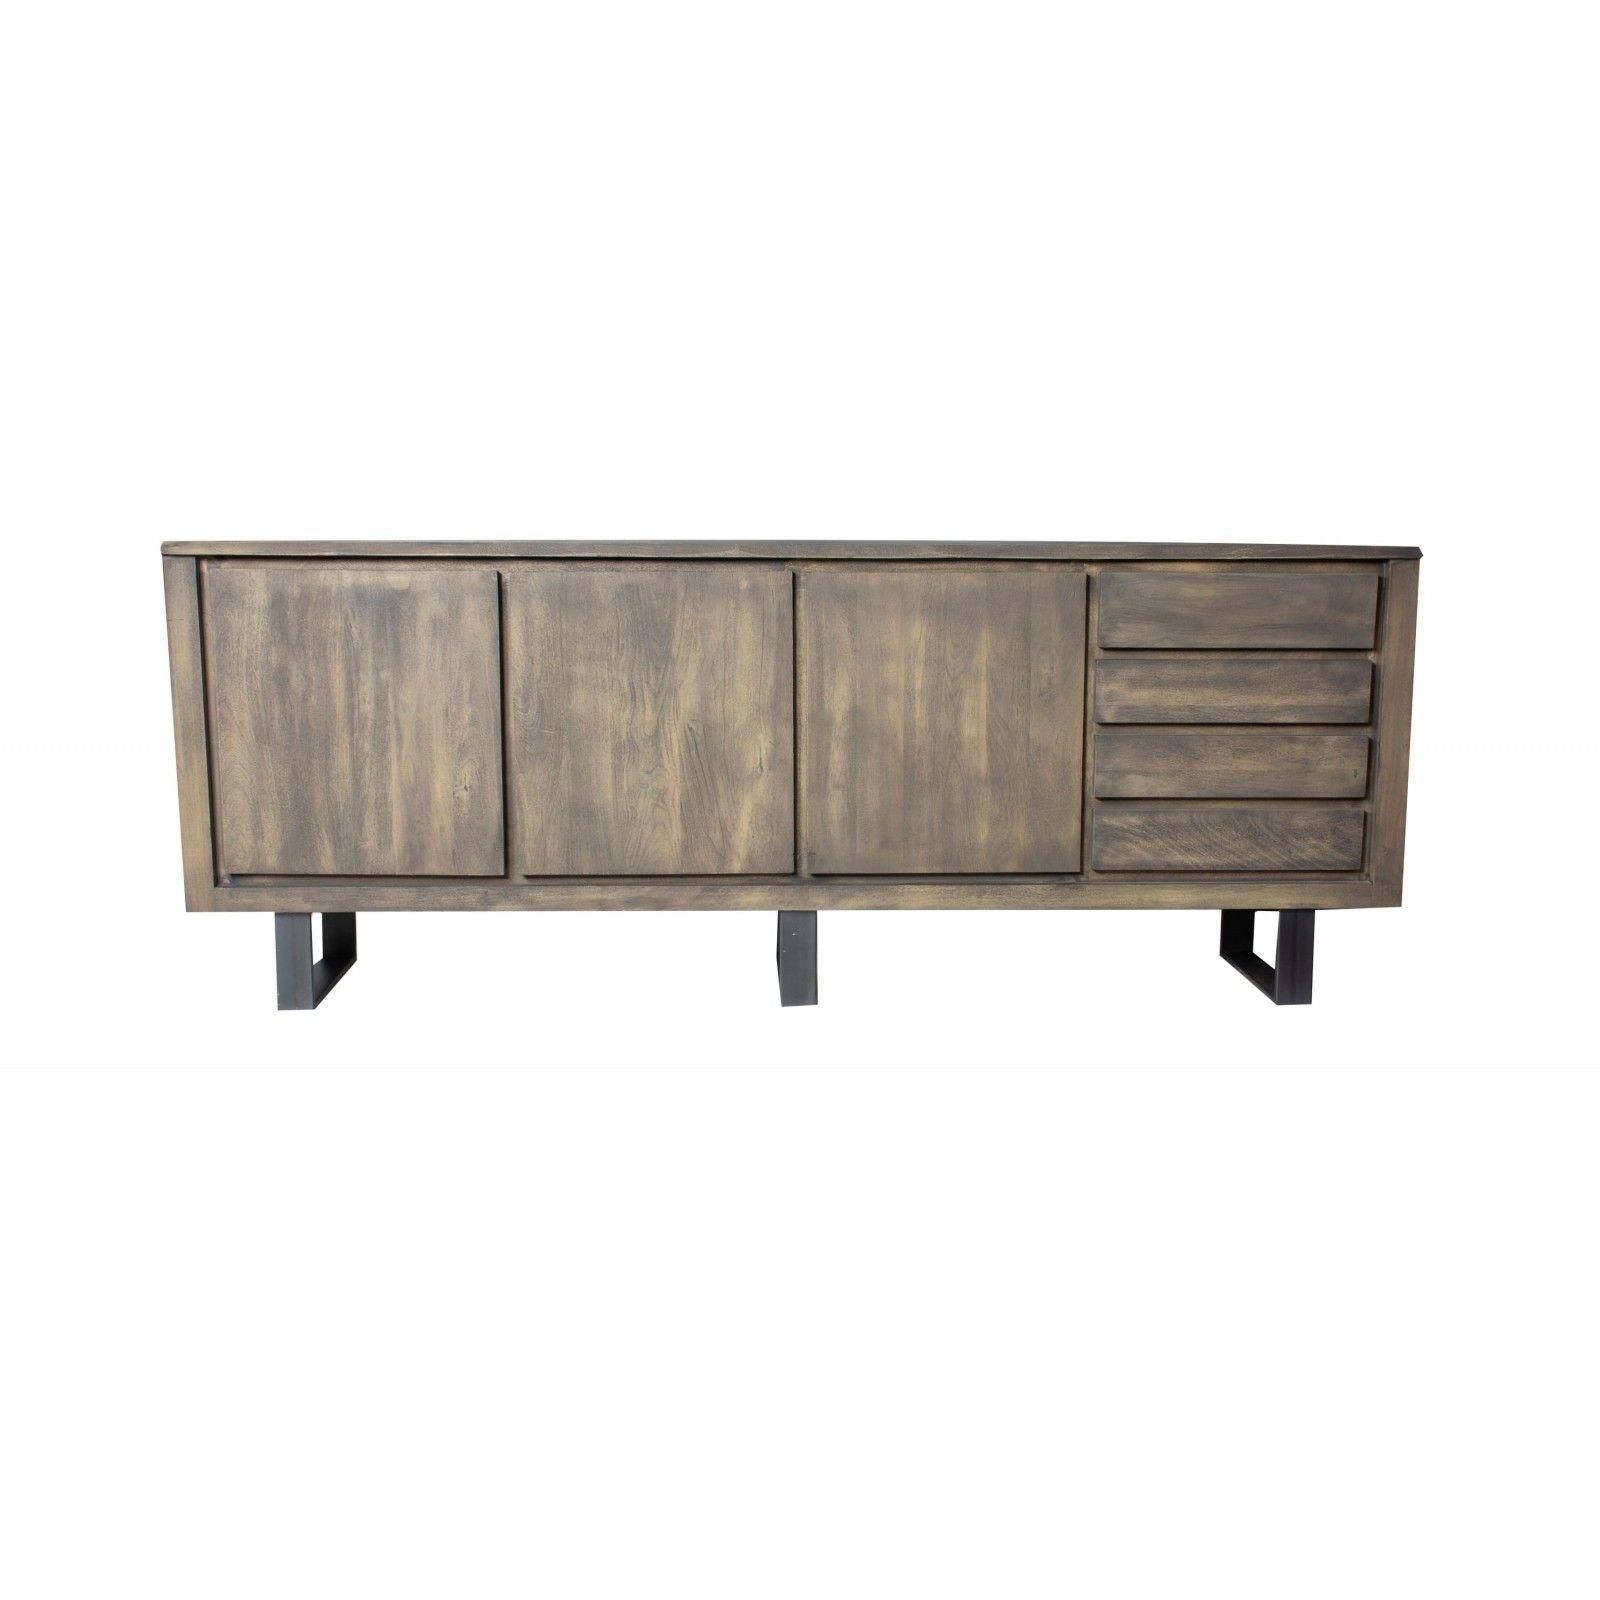 Buffet New York en bois manguier massif et métal 3 portes et 4 tiroirs